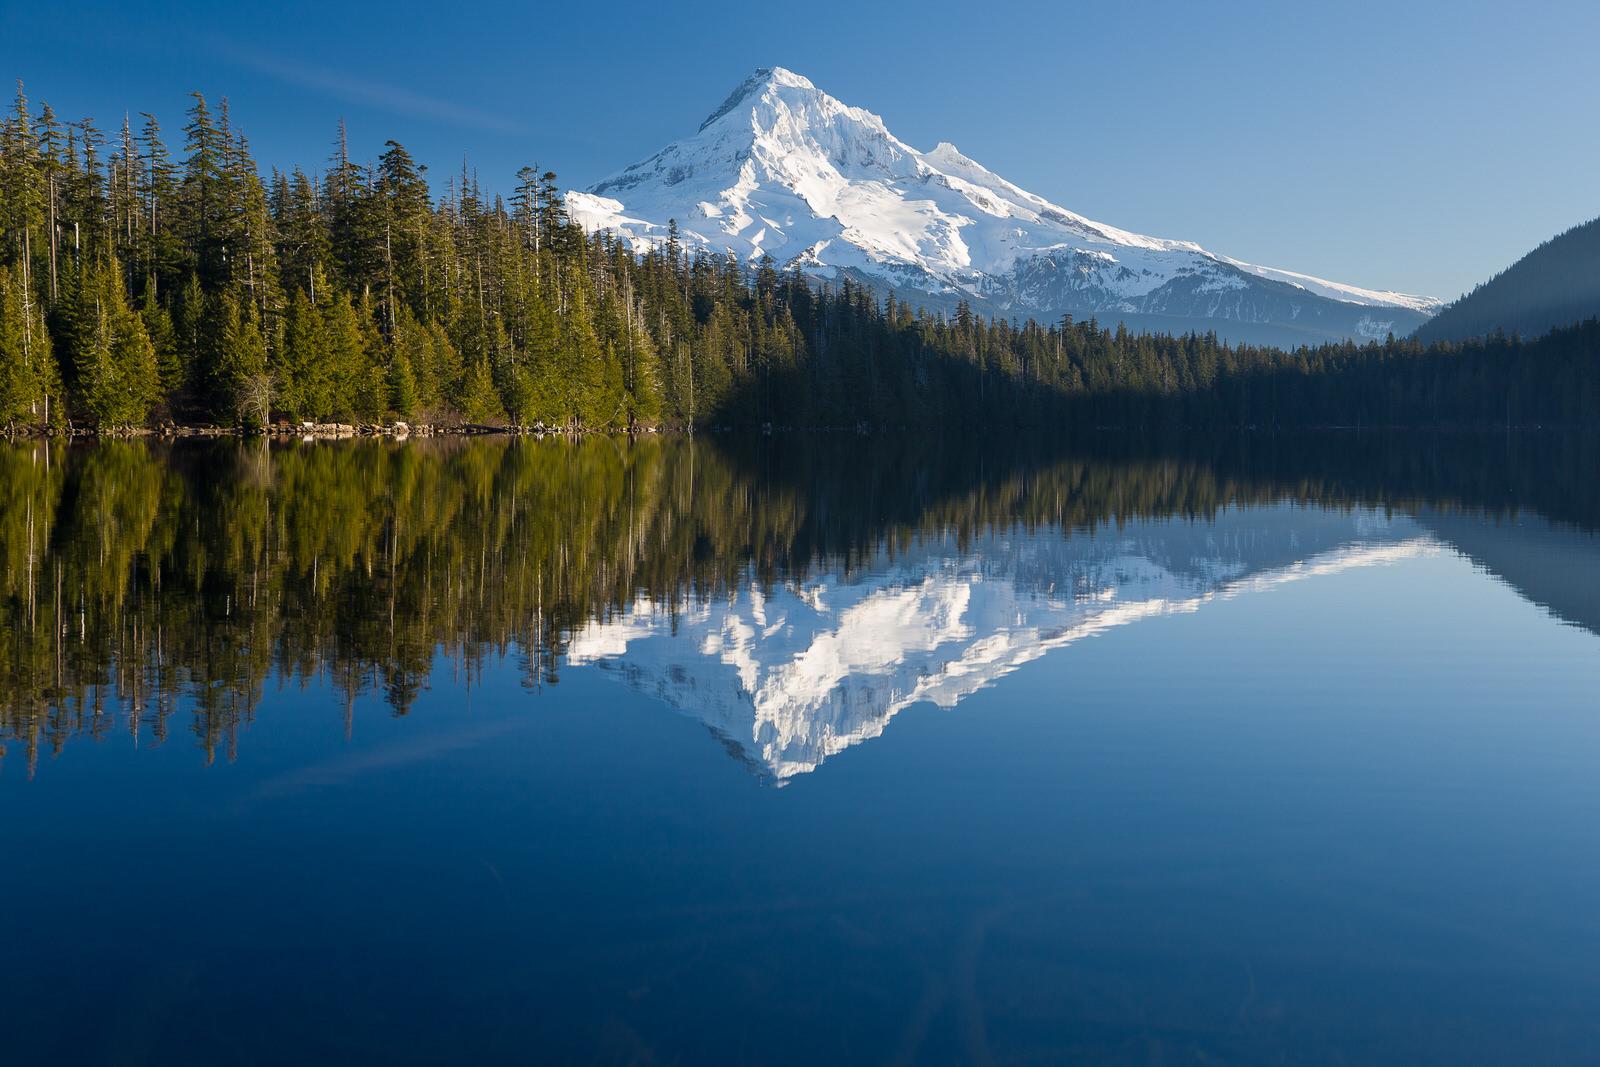 Mirror reflection of Mt. Hood at Lost Lake Resort